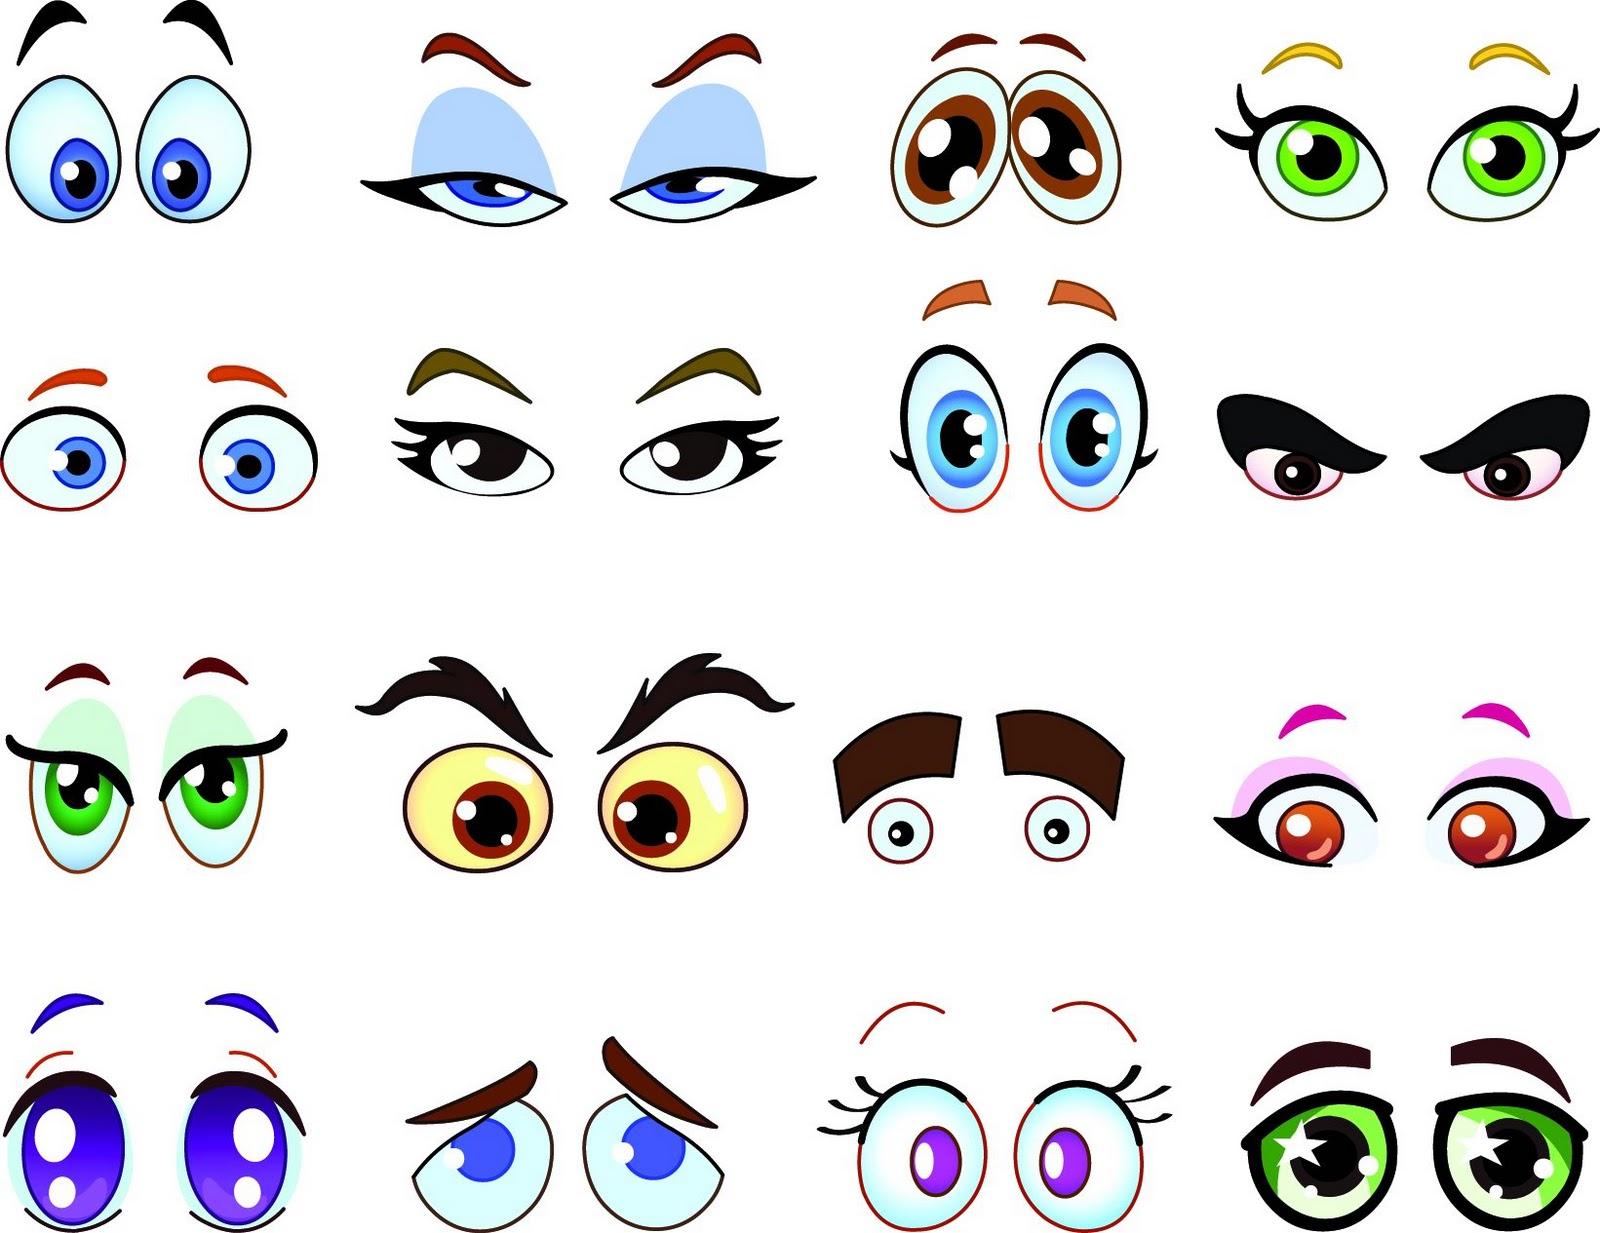 13 Happy Cartoon Eyes Vector Images